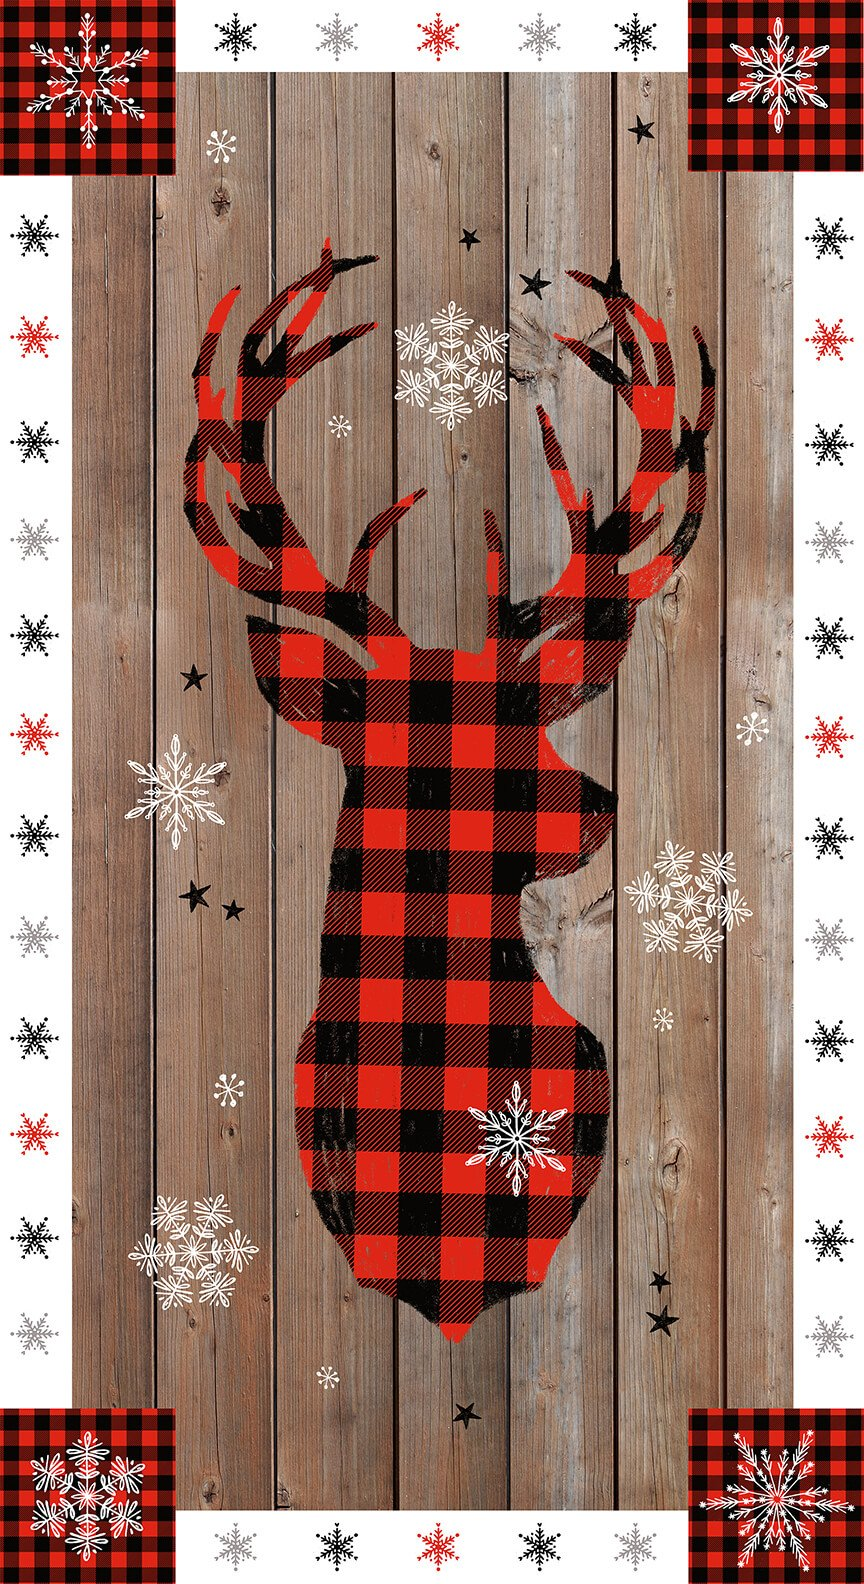 Warm Winter Wishes - Panel - Deer Centered on Wood Grain